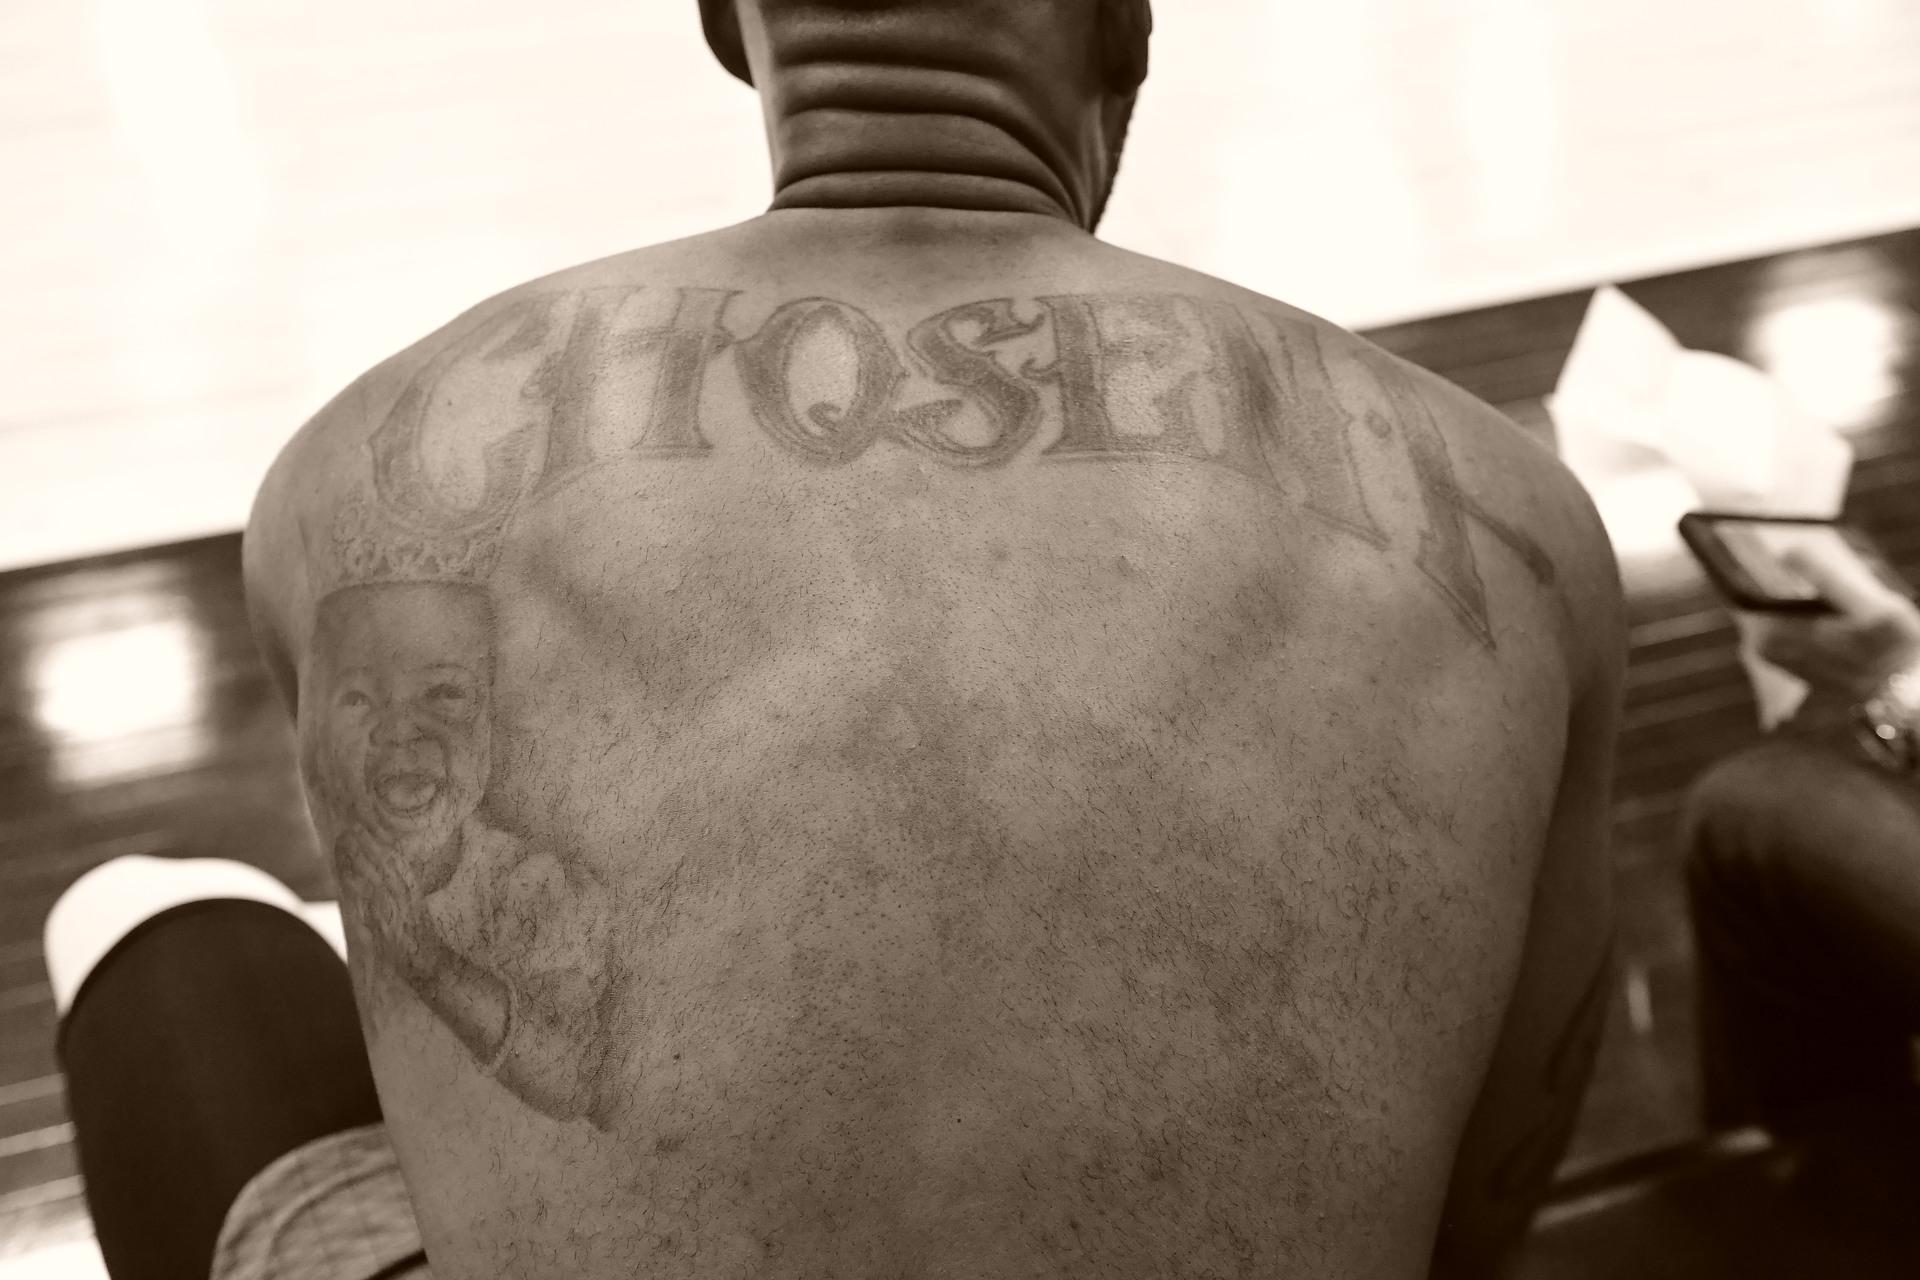 Lebron James Tattoos Removed | www.pixshark.com - Images ...